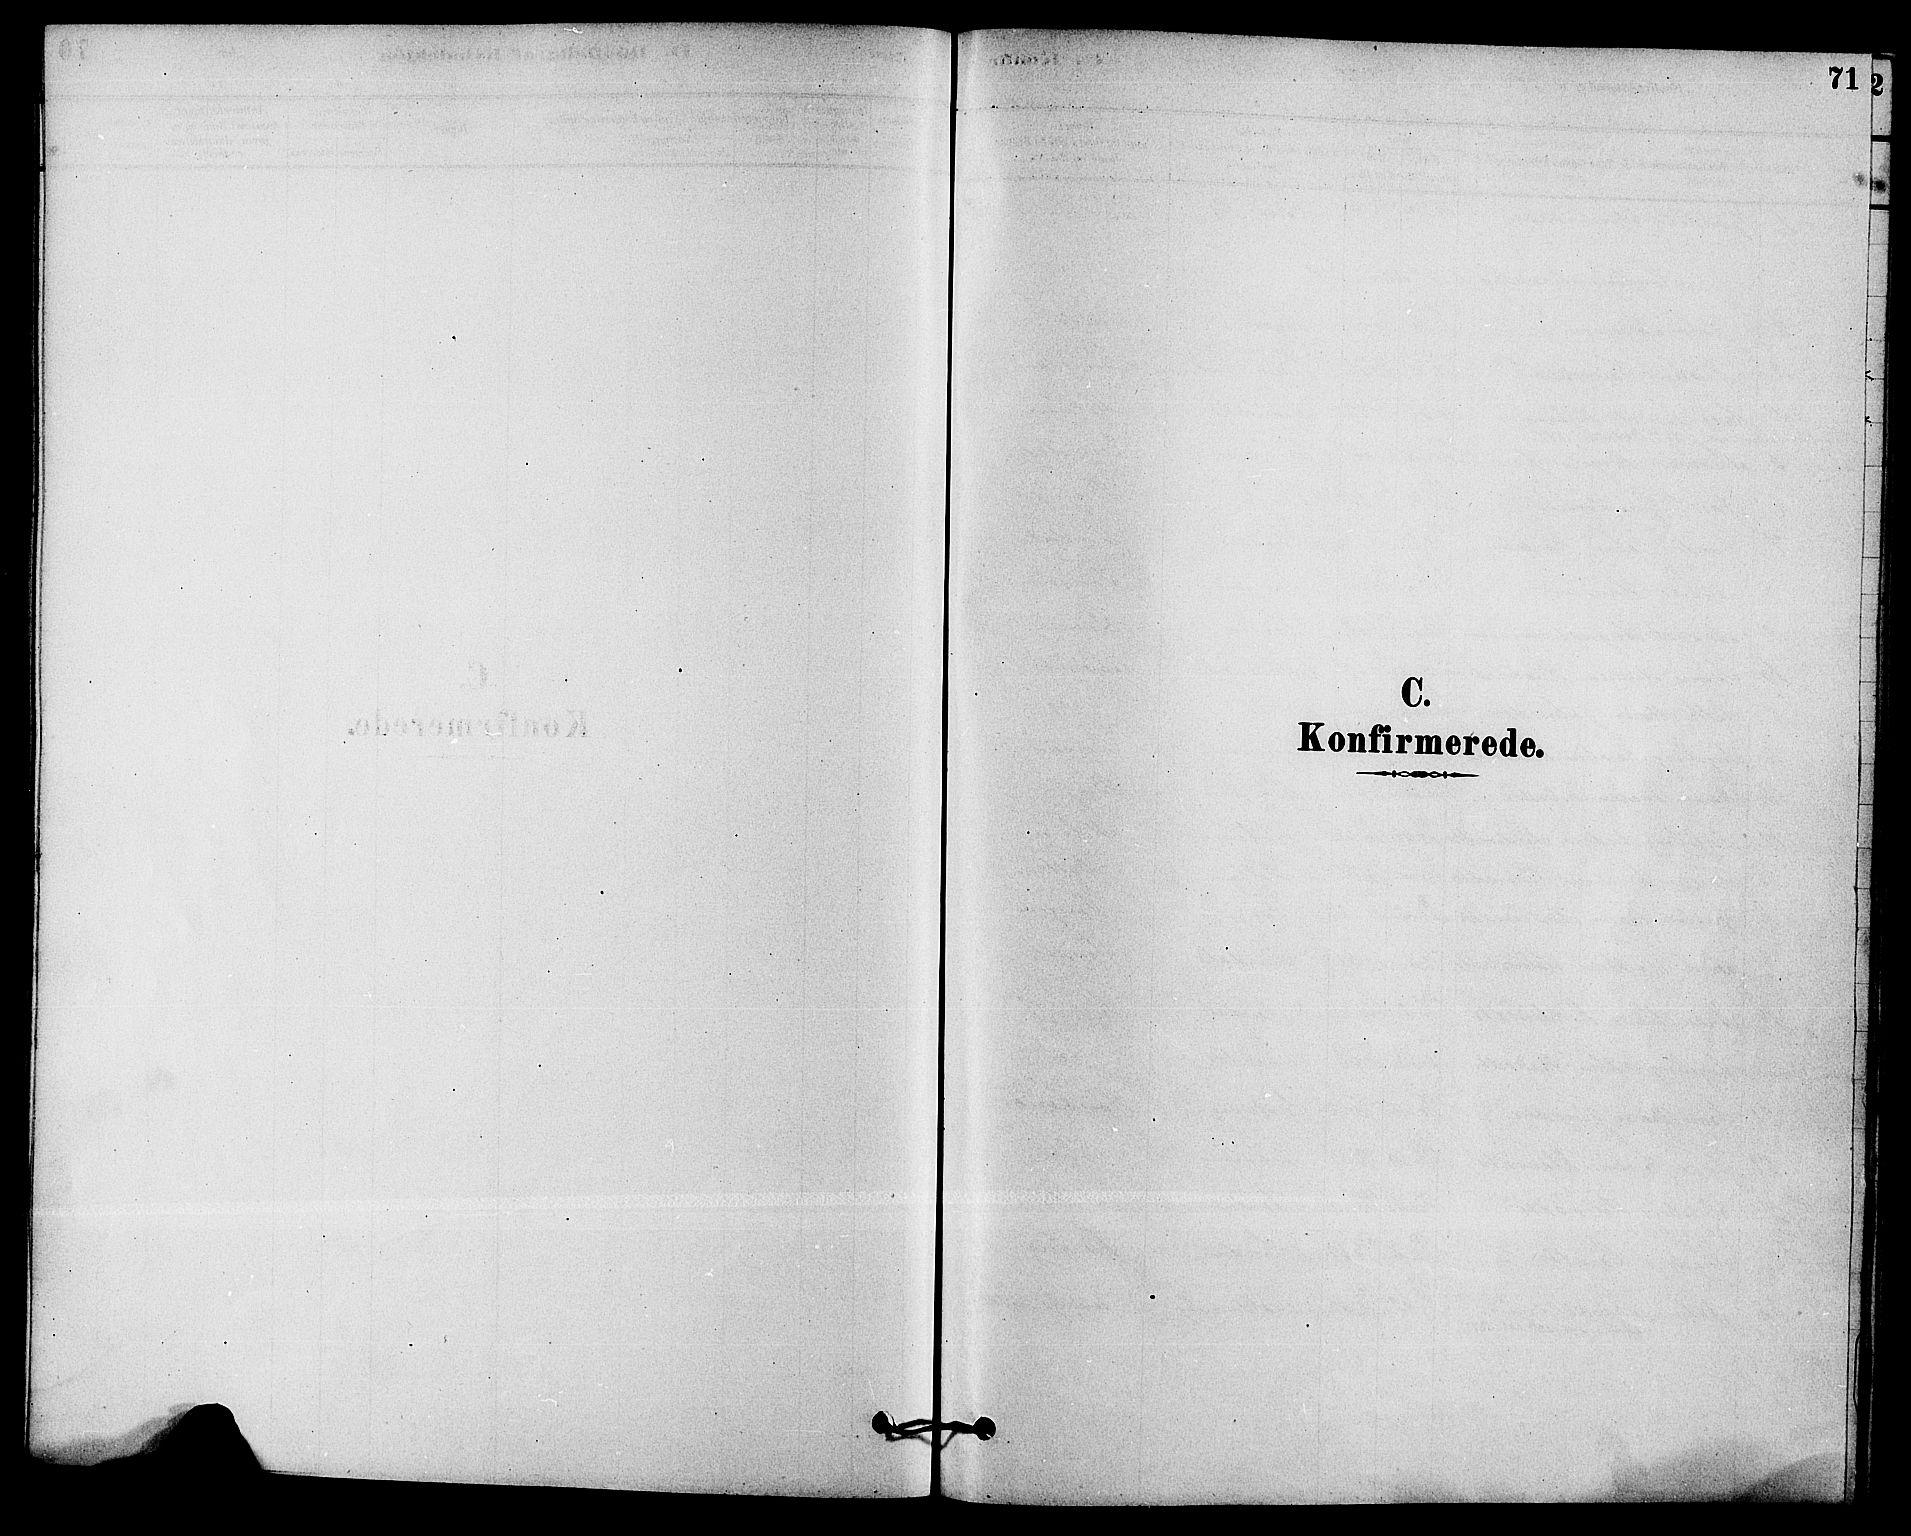 SAKO, Solum kirkebøker, F/Fb/L0001: Ministerialbok nr. II 1, 1877-1892, s. 71